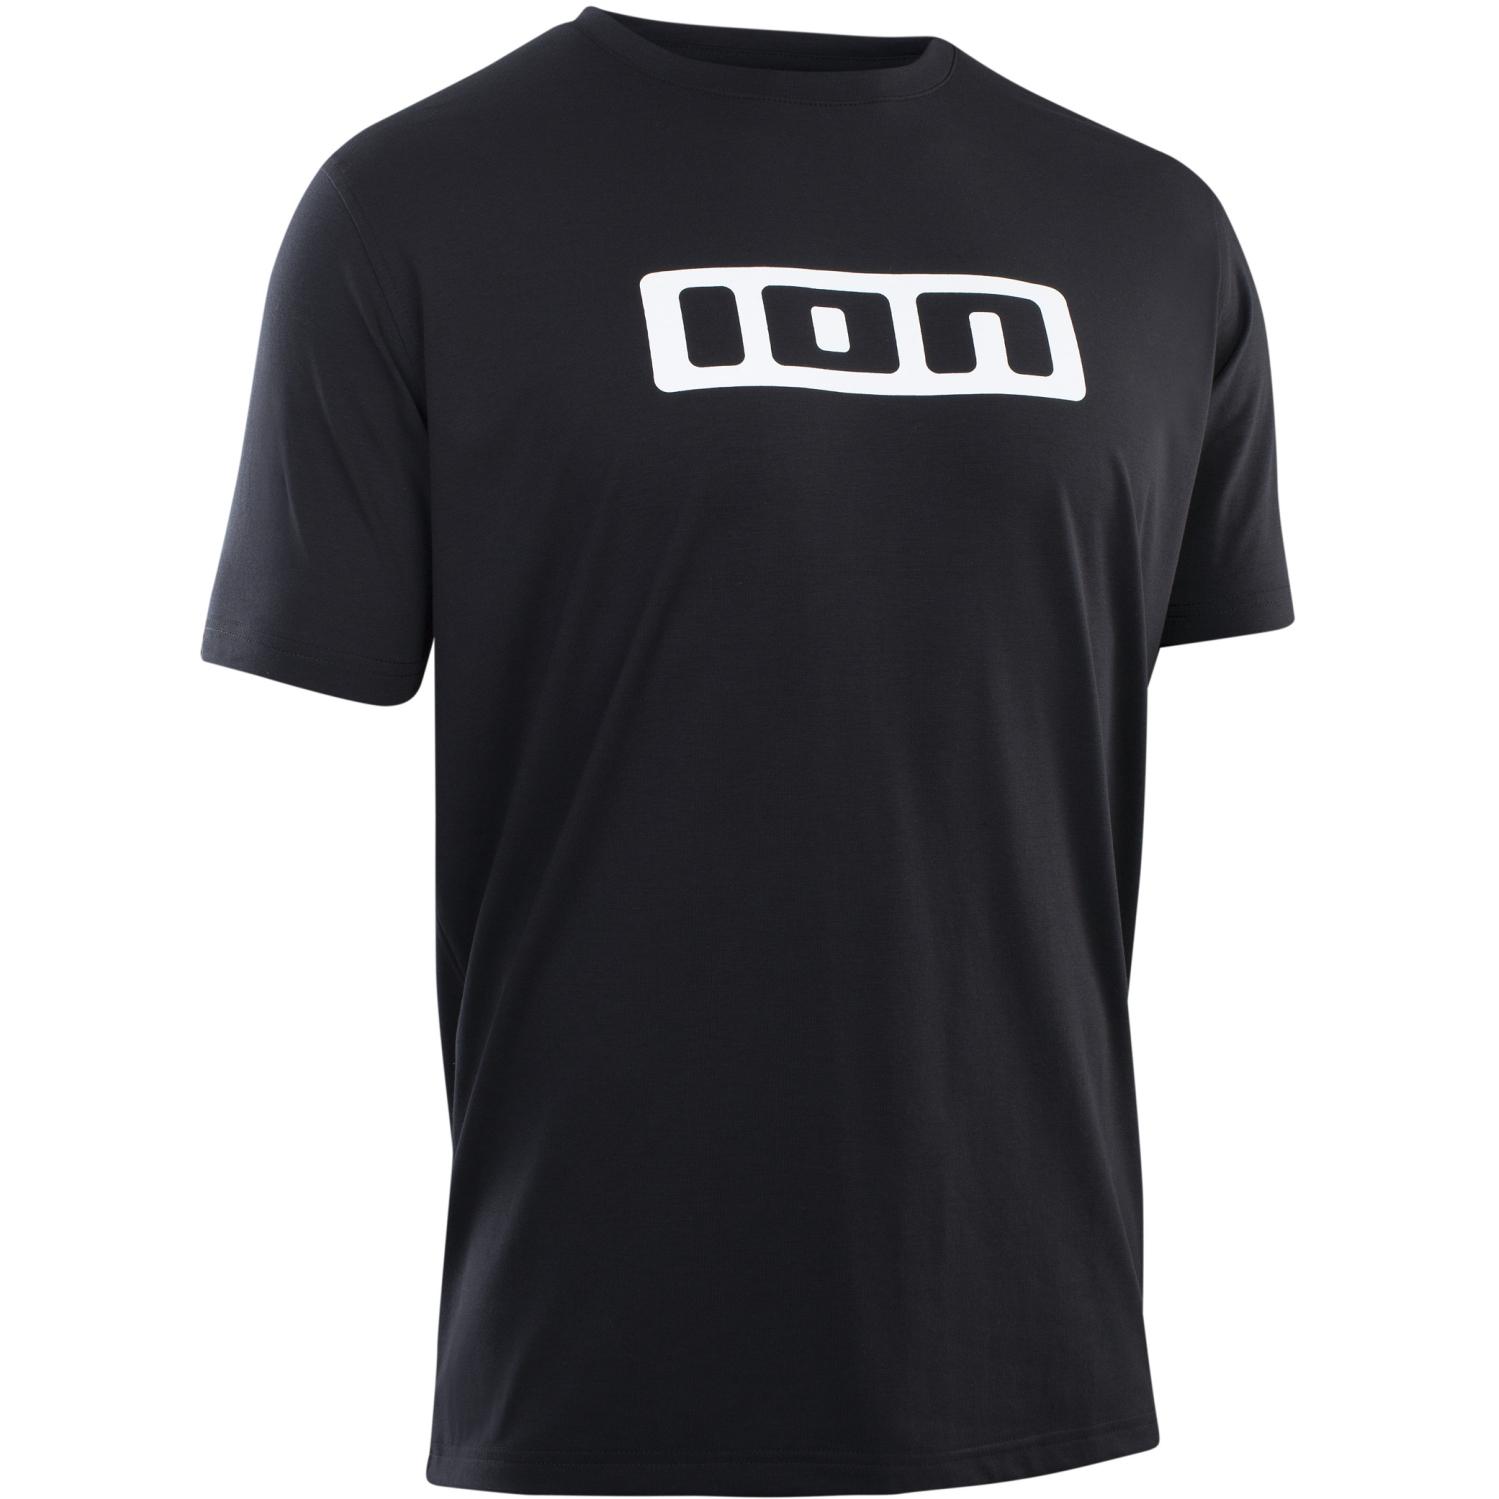 ION Bike Tee Short Sleeve Logo DR - Black